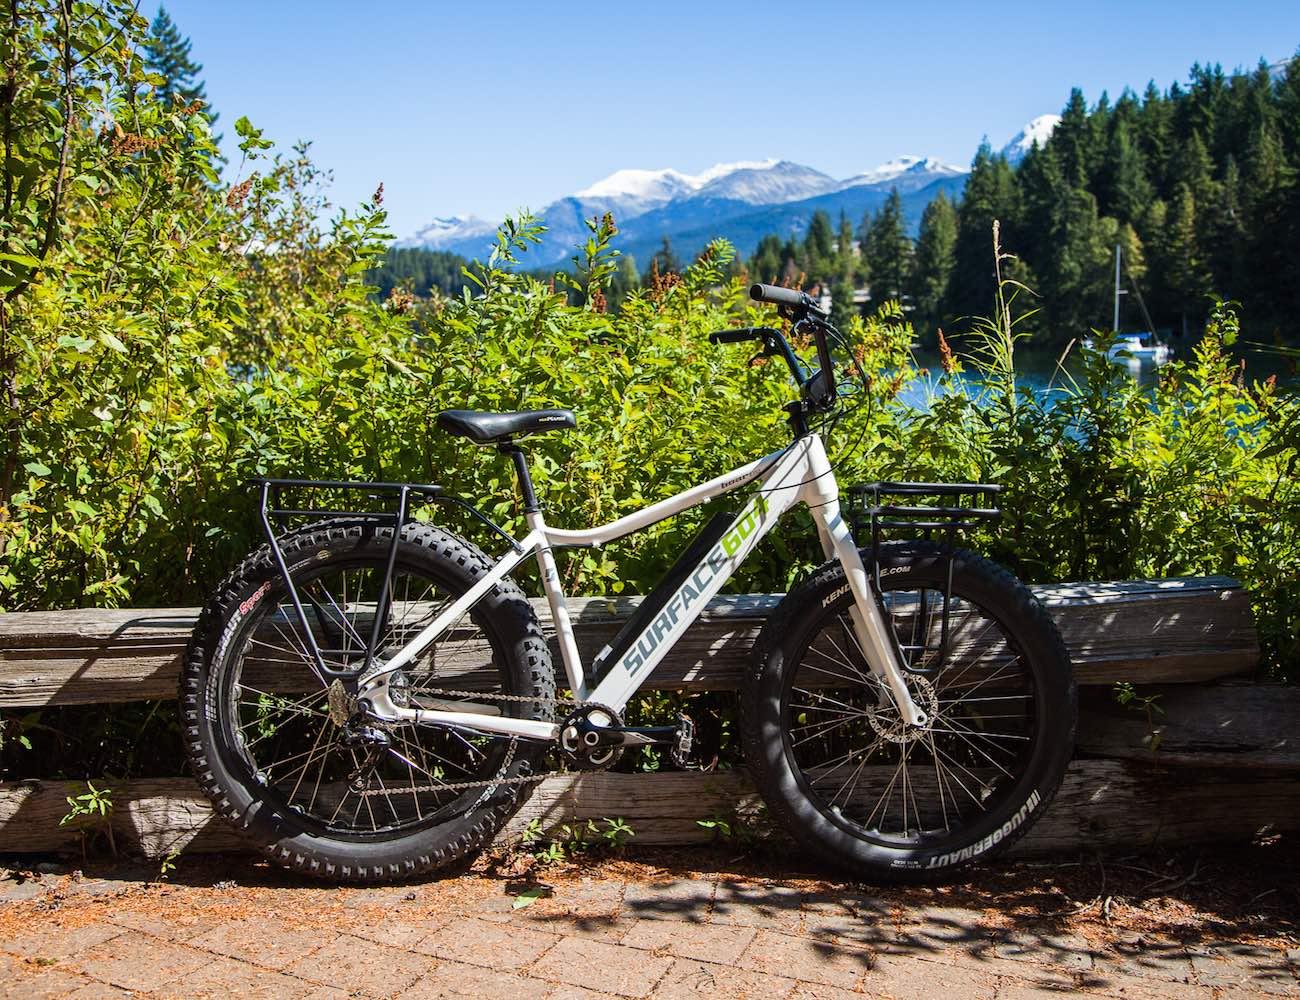 The 2016 Surface 604 Boar Electric Fat Bike